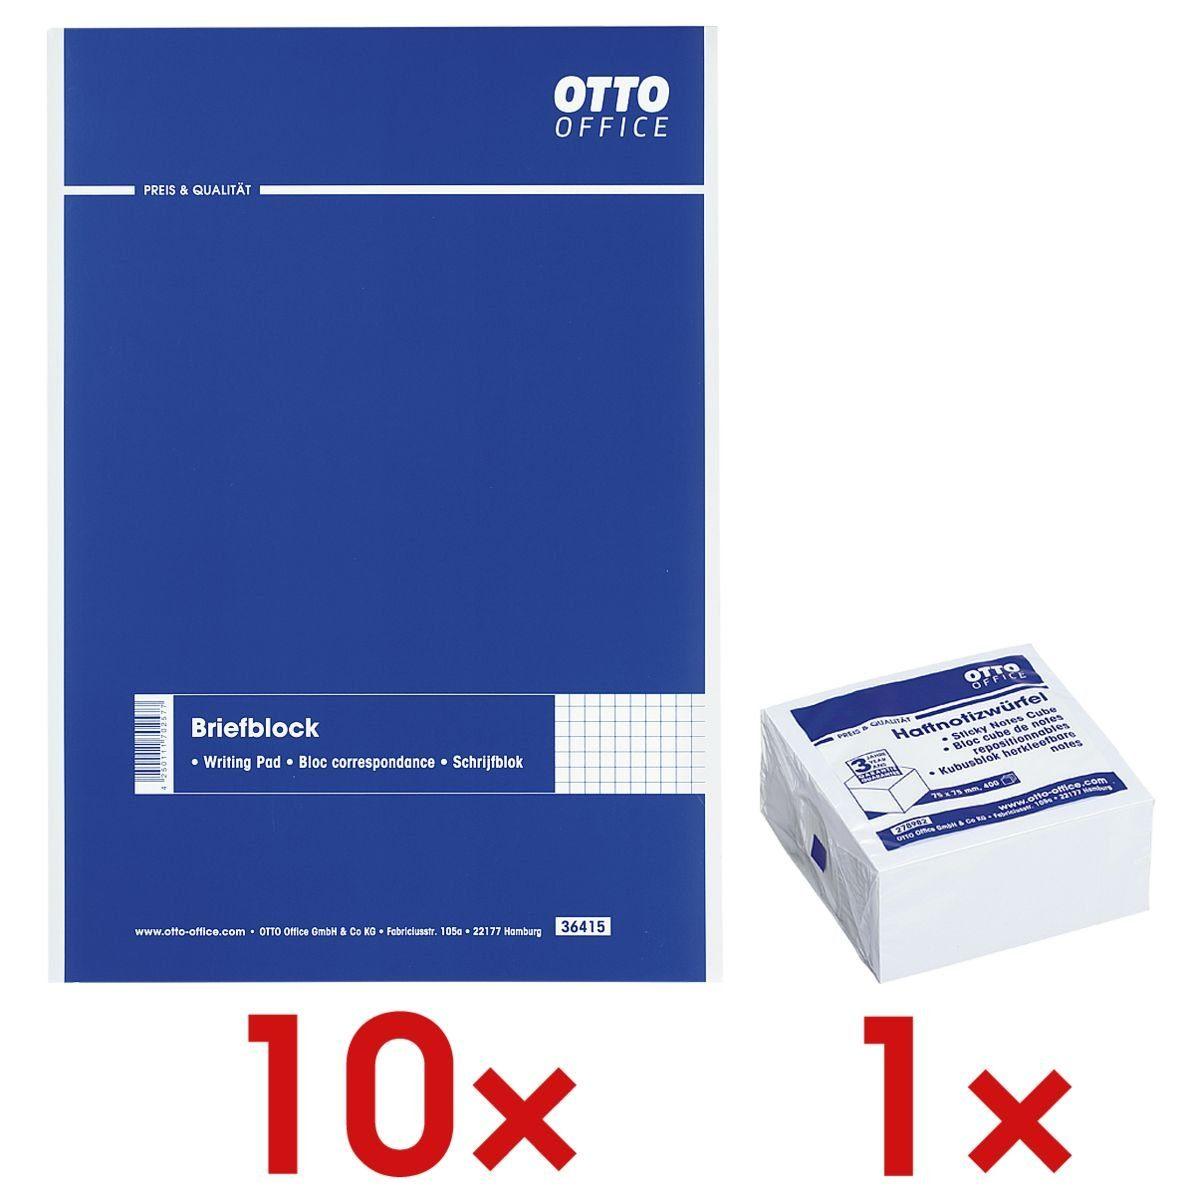 OTTOOFFICE STANDARD 10 Briefblöcke inkl.1 Haftnotizwürfel 1 Set